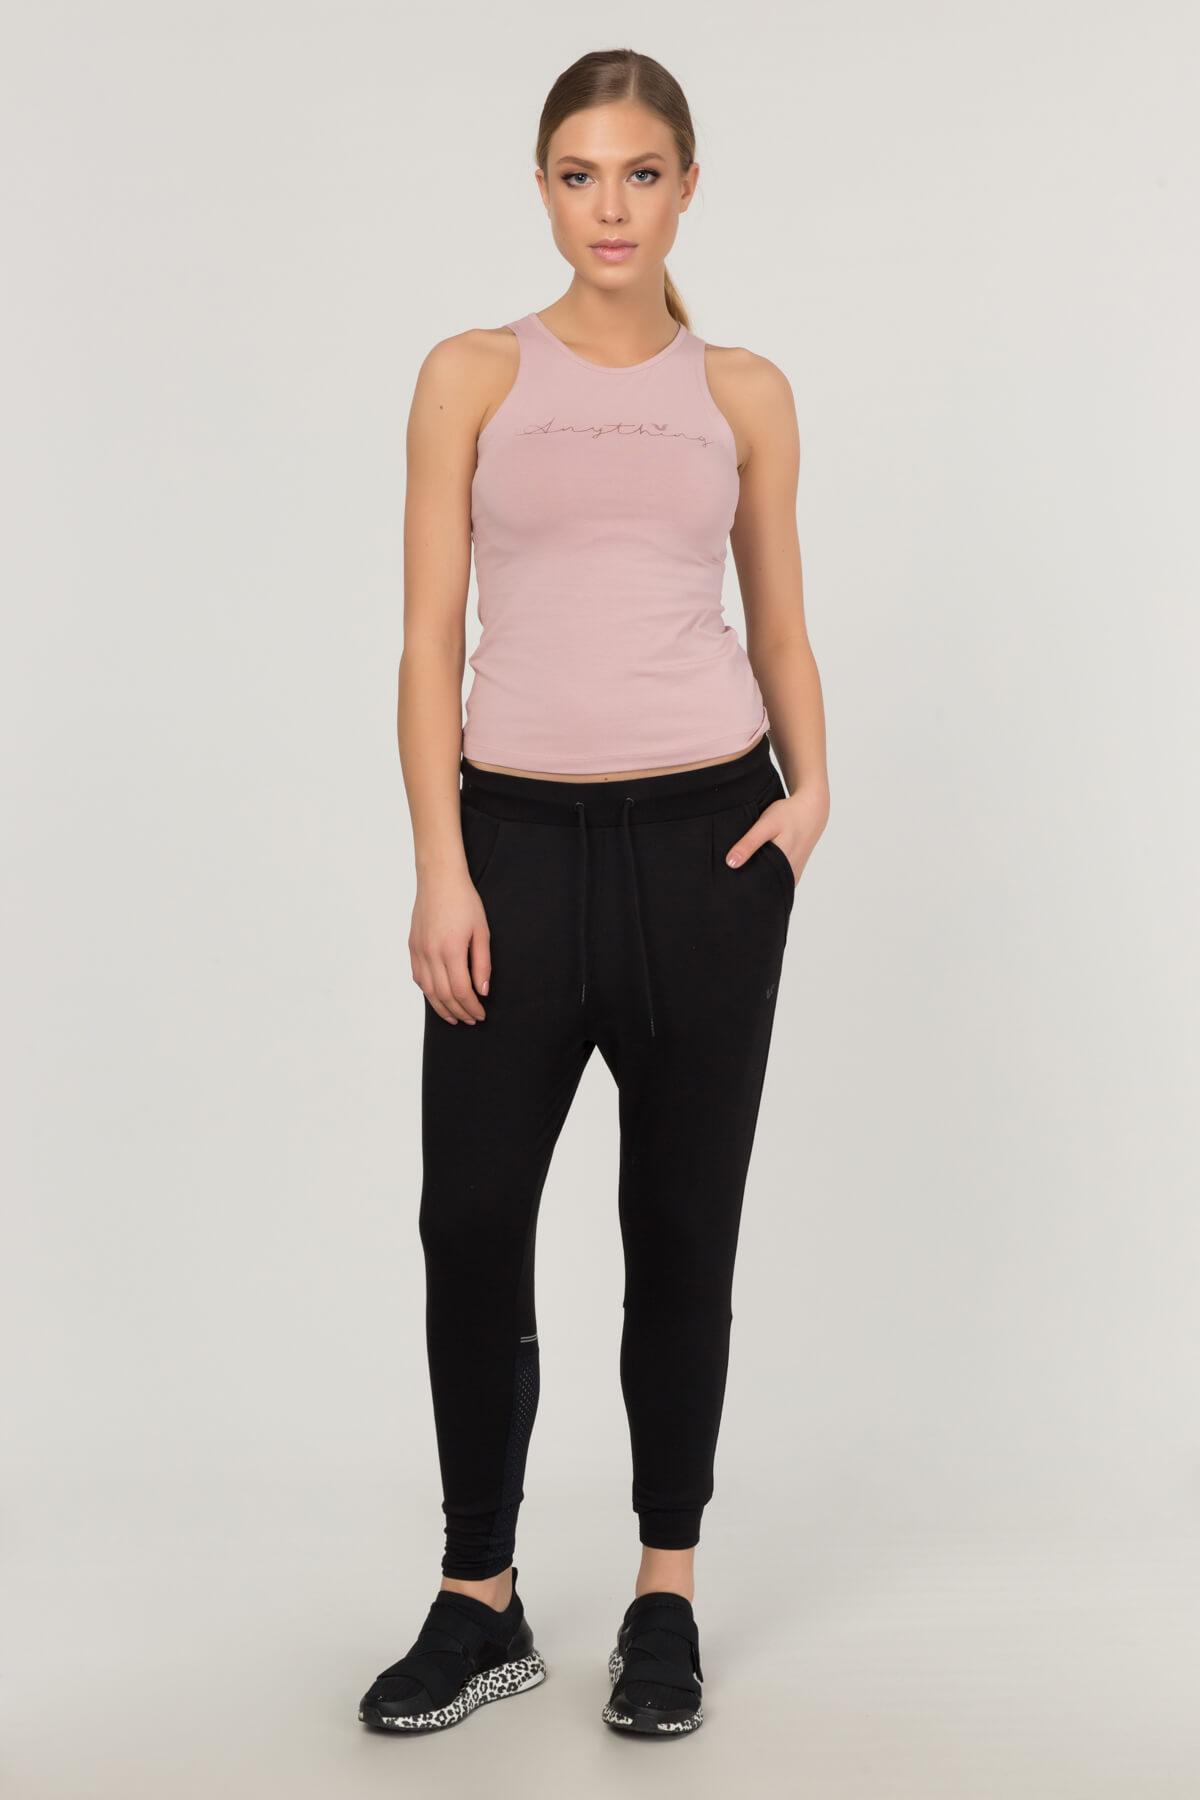 Bilcee Pamuklu Yoga Kadın Atleti FS-4018 BİLCEE